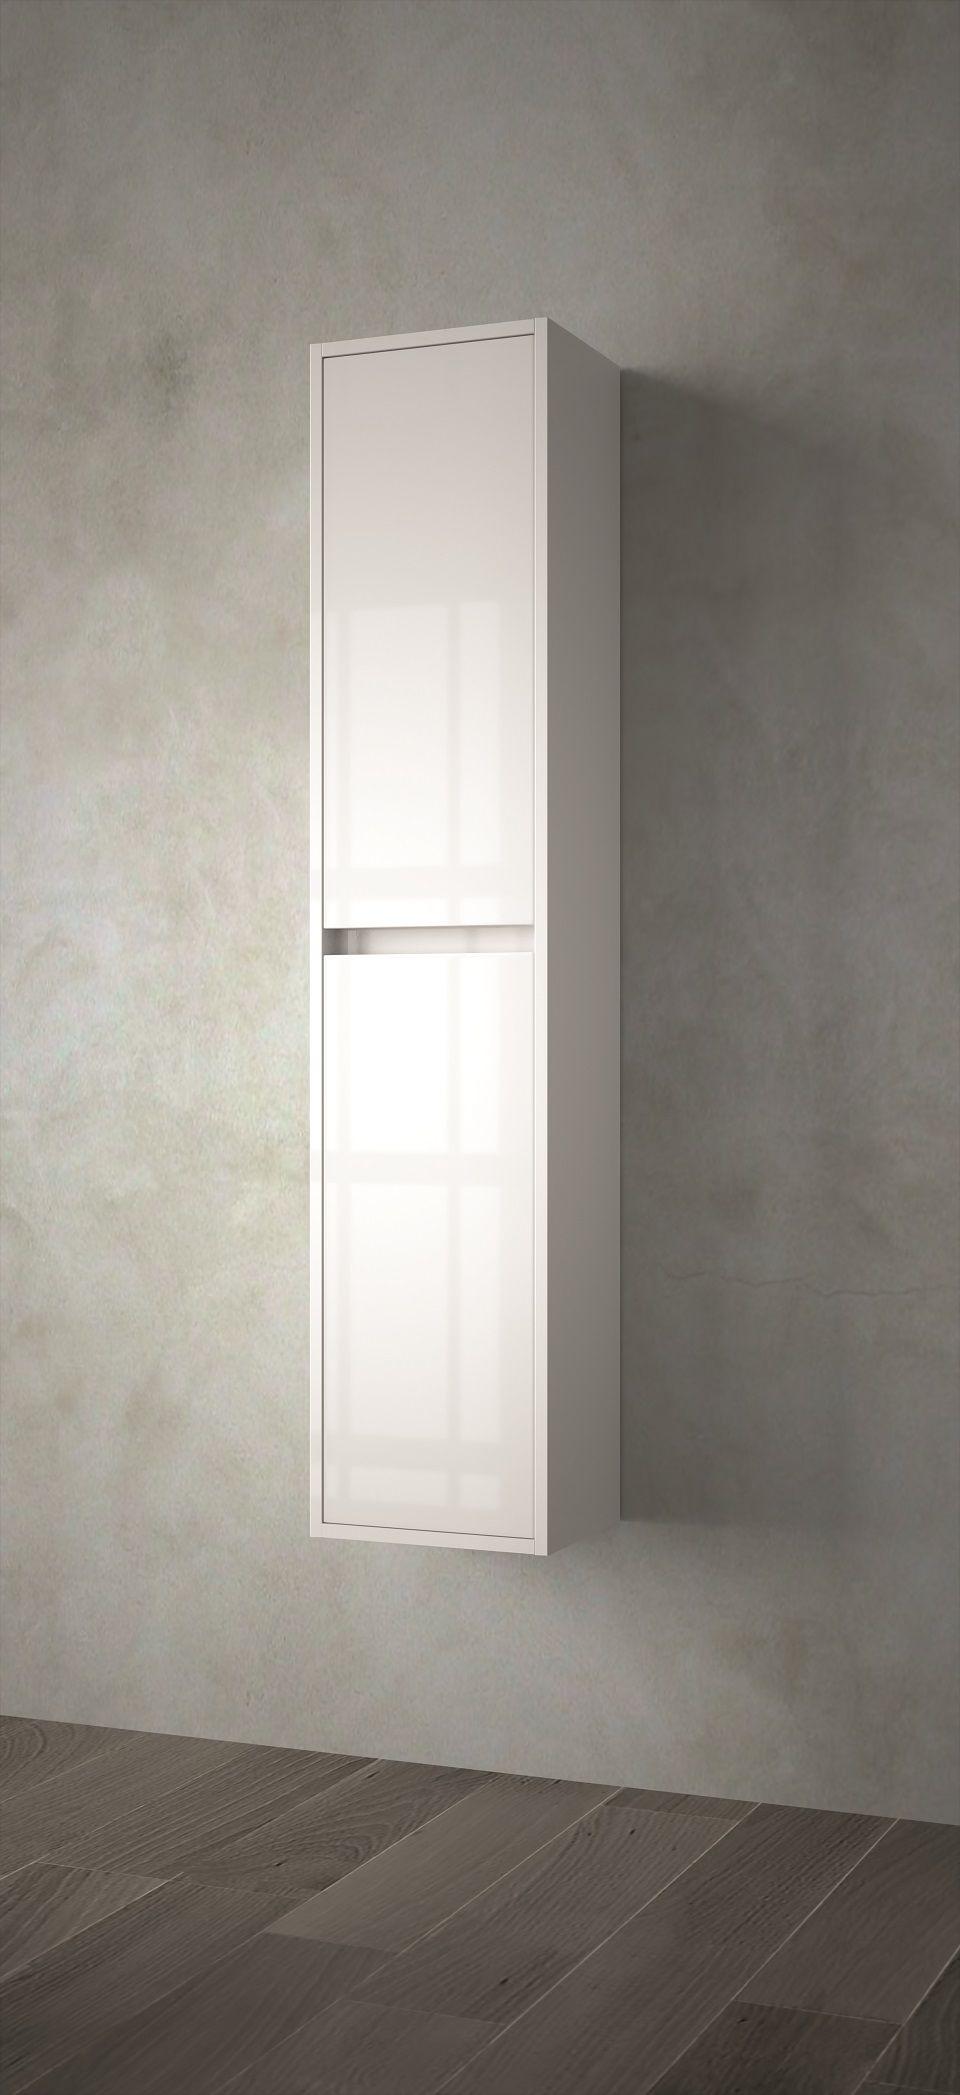 Muebles Project badkamerkast 140x30x24cm hoogglans wit